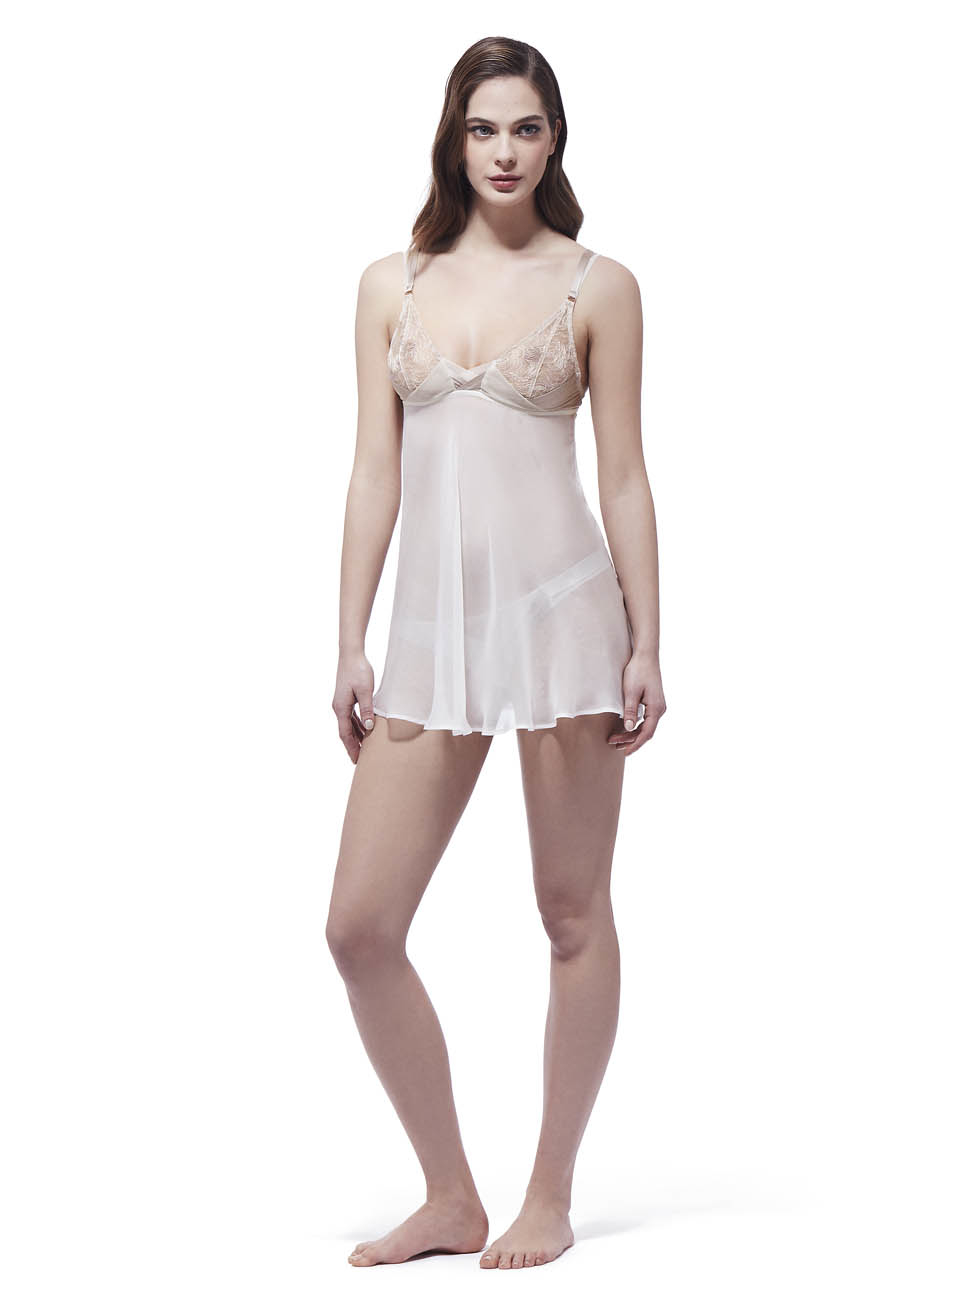 Myla Babydoll in White... Dita Eyewear